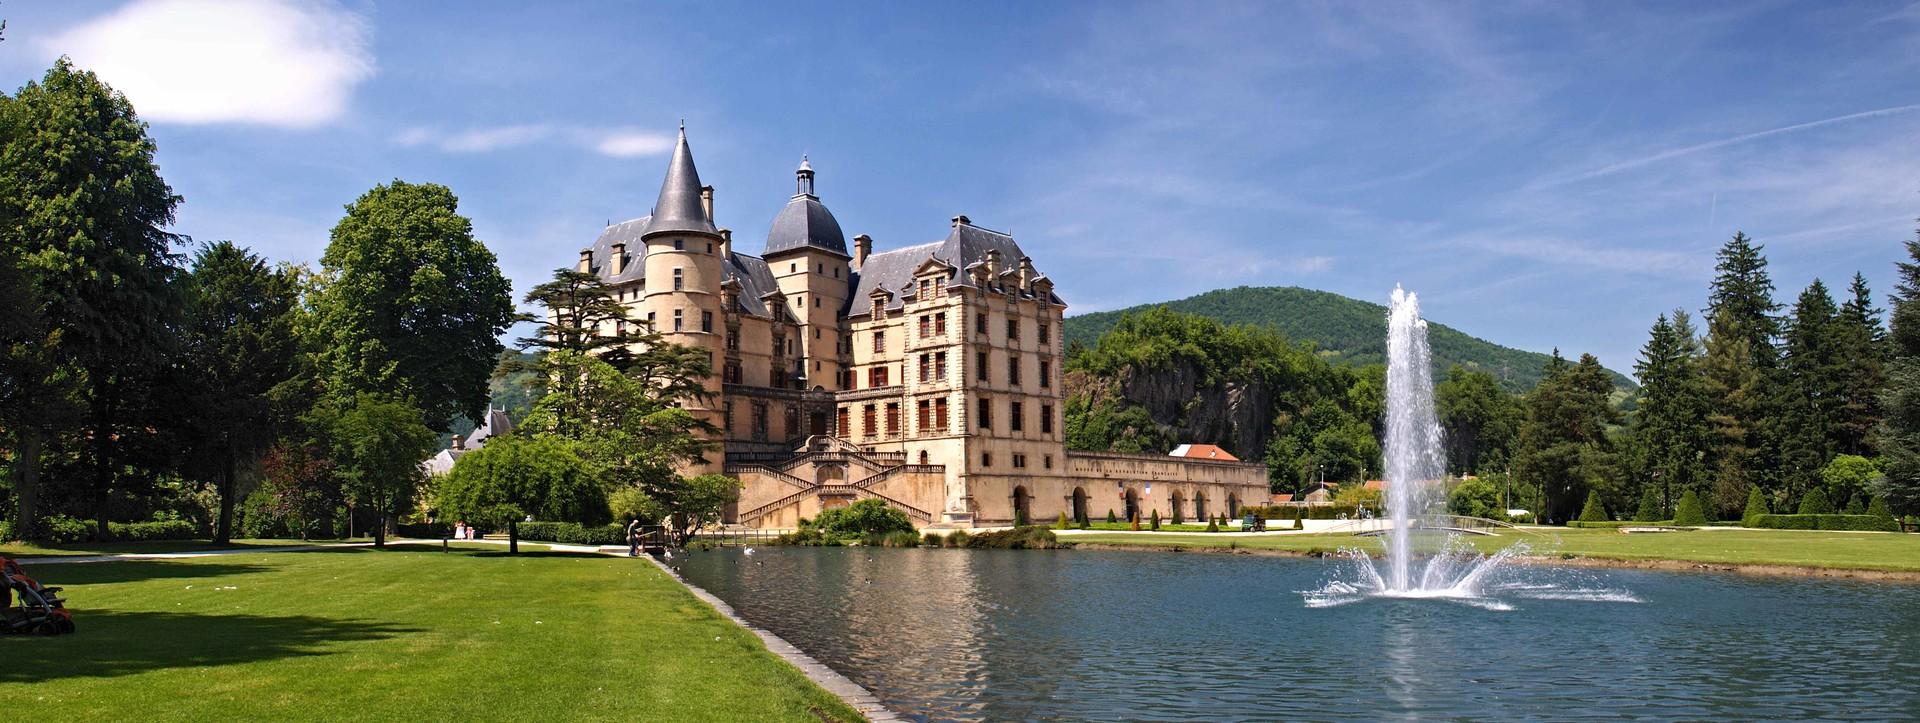 Chateau de Vizille, Isere, France  № 156851 бесплатно